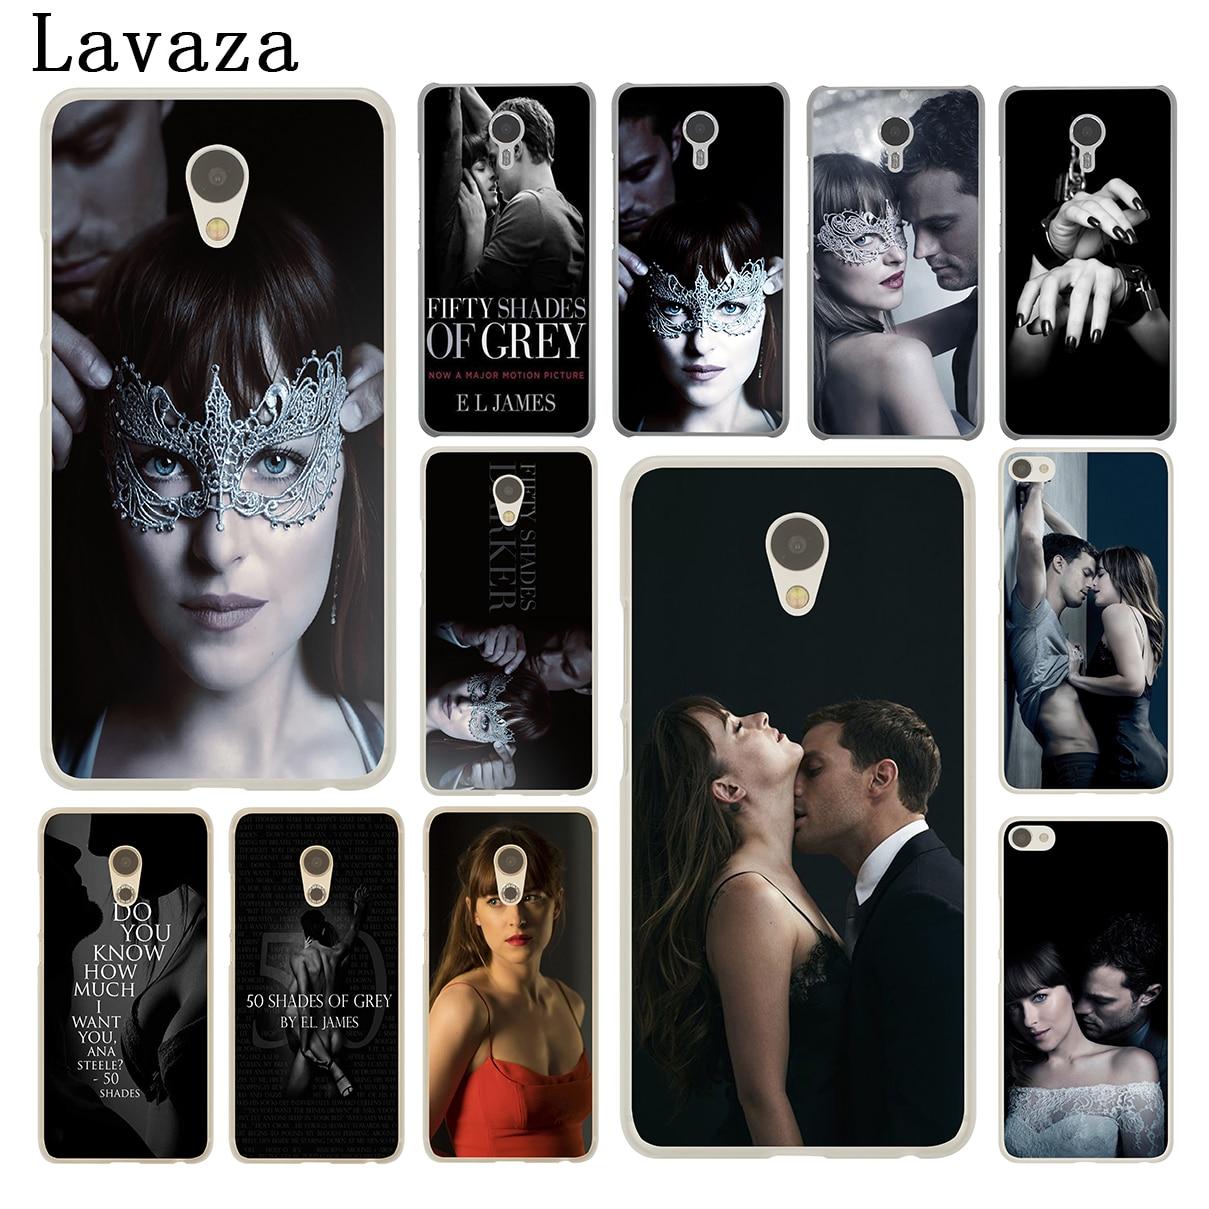 Lavaza Fifty Shades Darker of grey freed Hard Phone Case for Meizu M5C M6 M5 M5S M2 M3 M3S Mini Note U10 U20 Pro 7 Plus 6 Cover ...